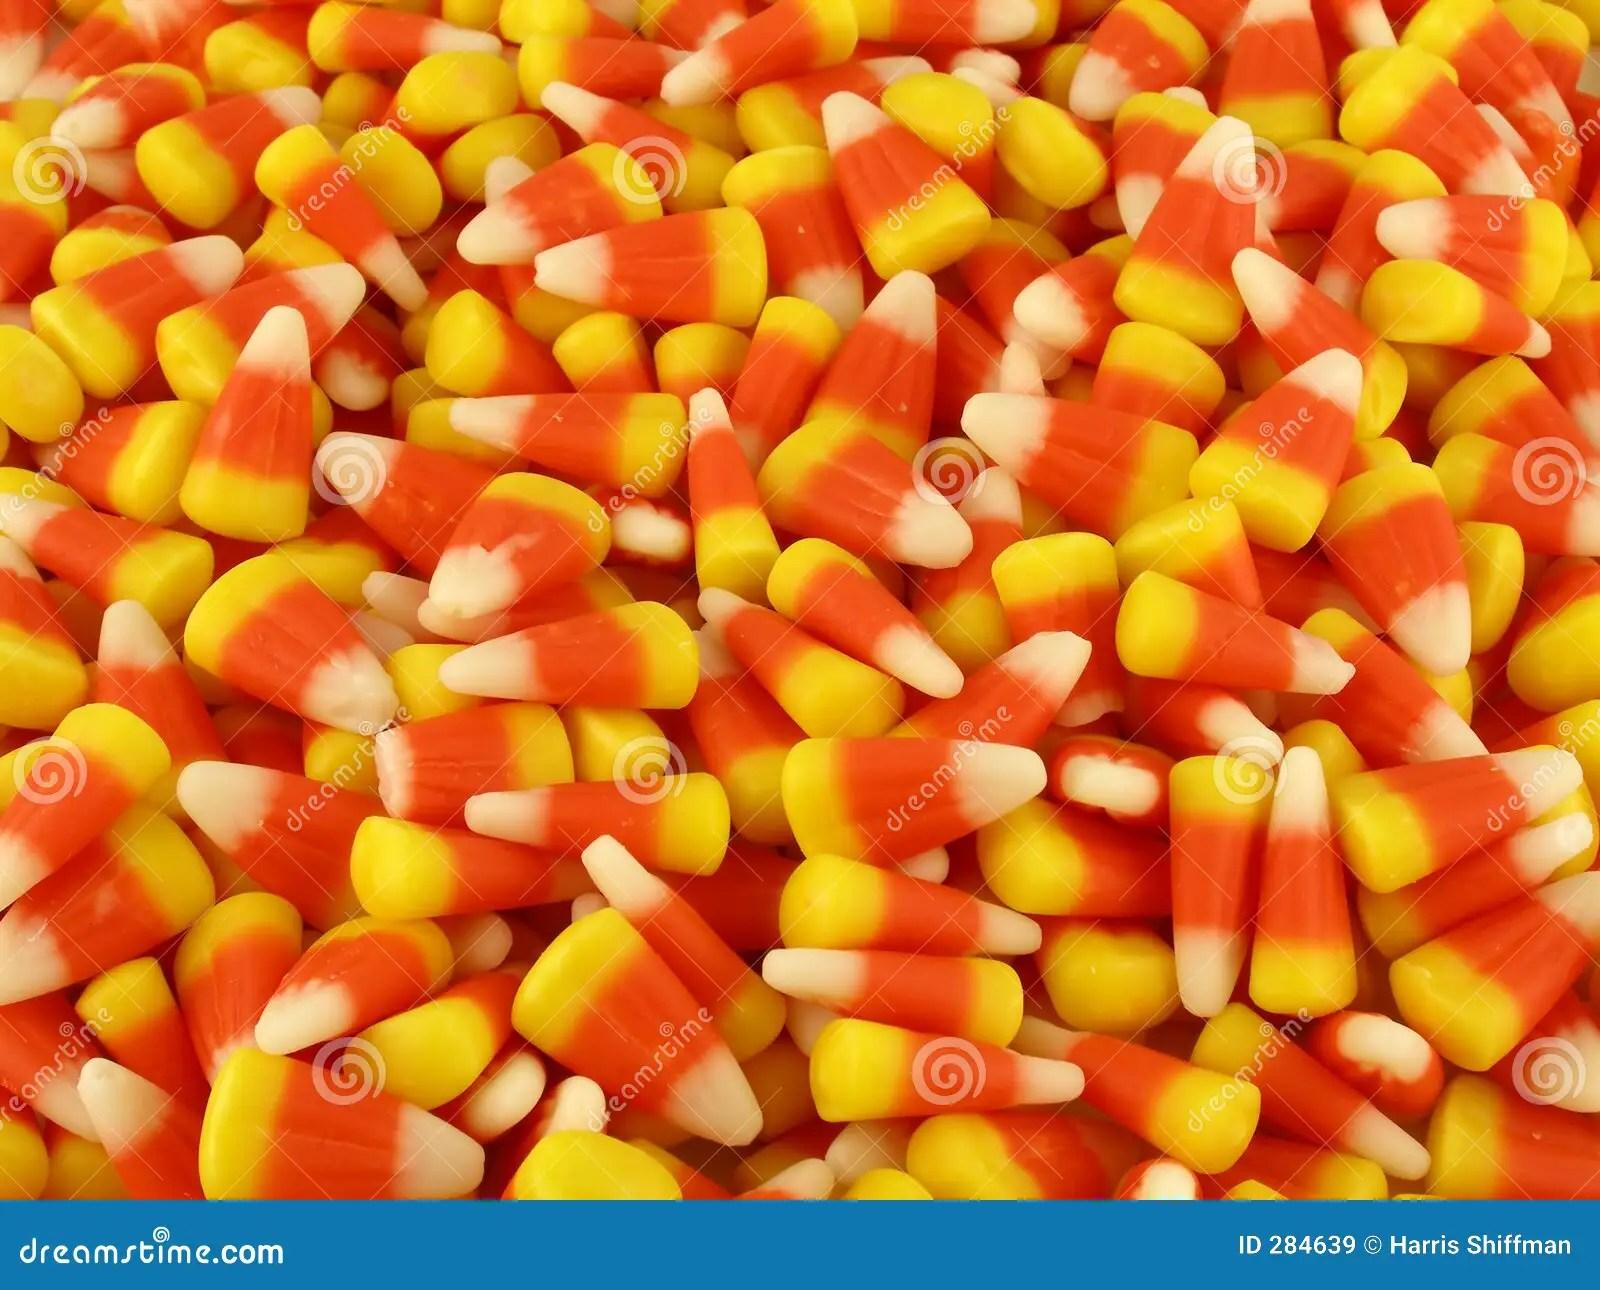 Fall White Pumpkins Wallpaper Candy Corn Stock Image Image Of Orange Layer Yellow